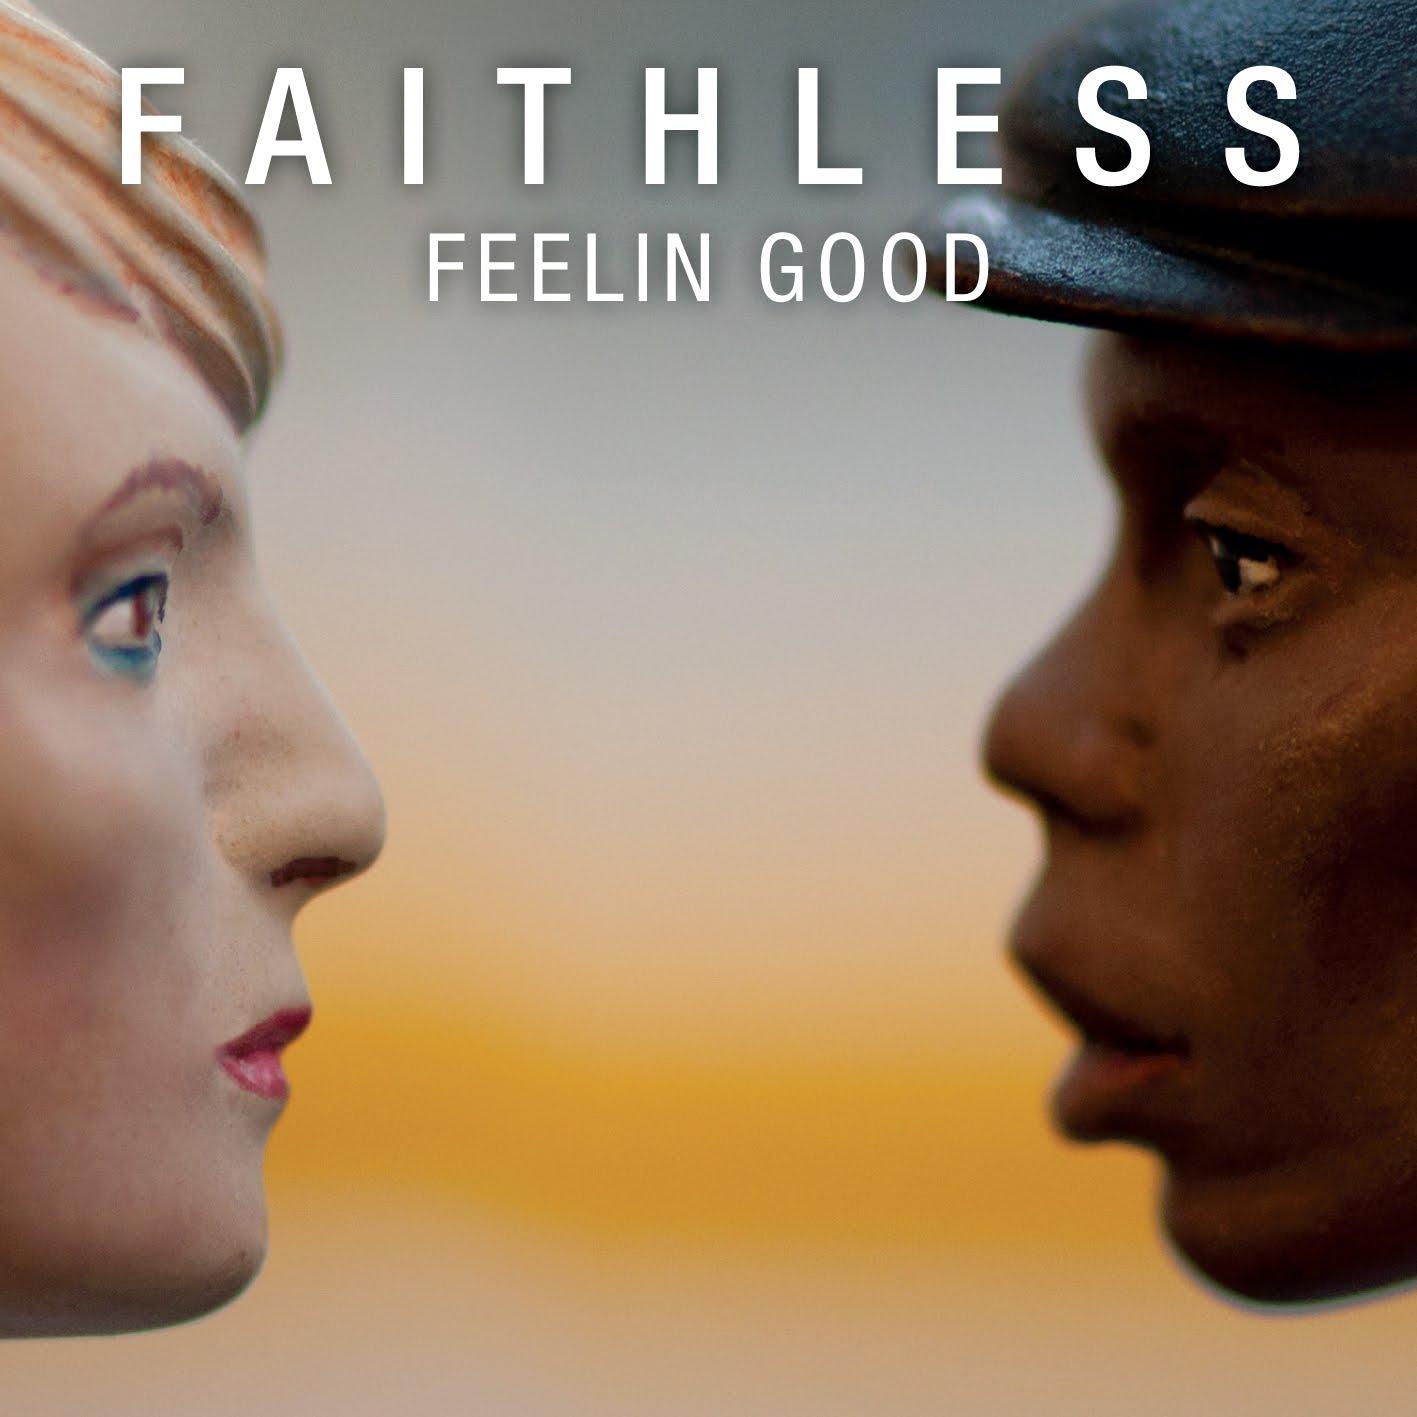 http://2.bp.blogspot.com/_wBa7Q-Vbuuc/TK6zwzaGryI/AAAAAAAALAg/p3bJ1-AKPmg/s1600/Faithless.jpg